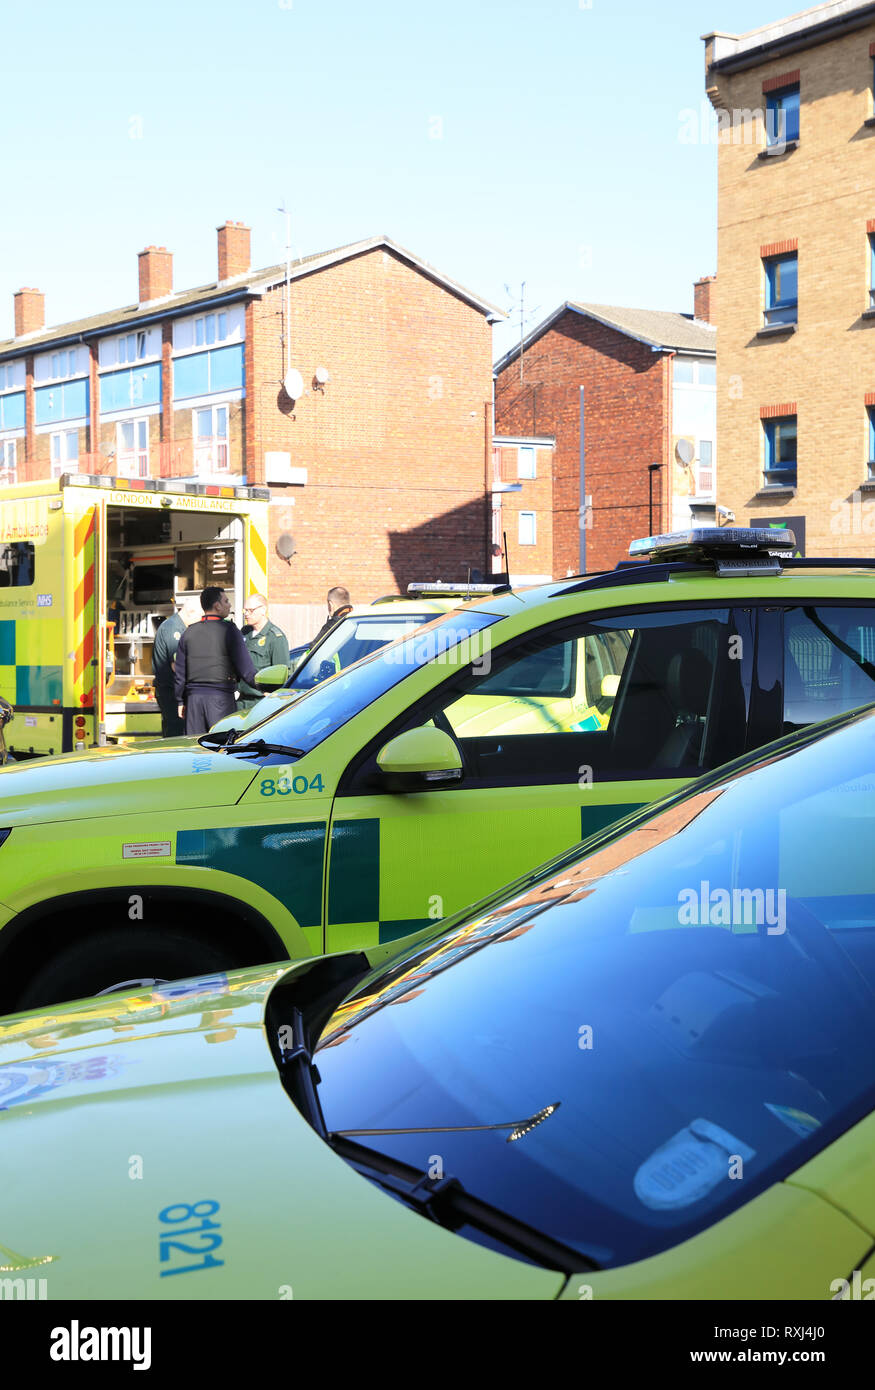 Paramedics and ambulances in Canning Town, east London England, UK - Stock Image